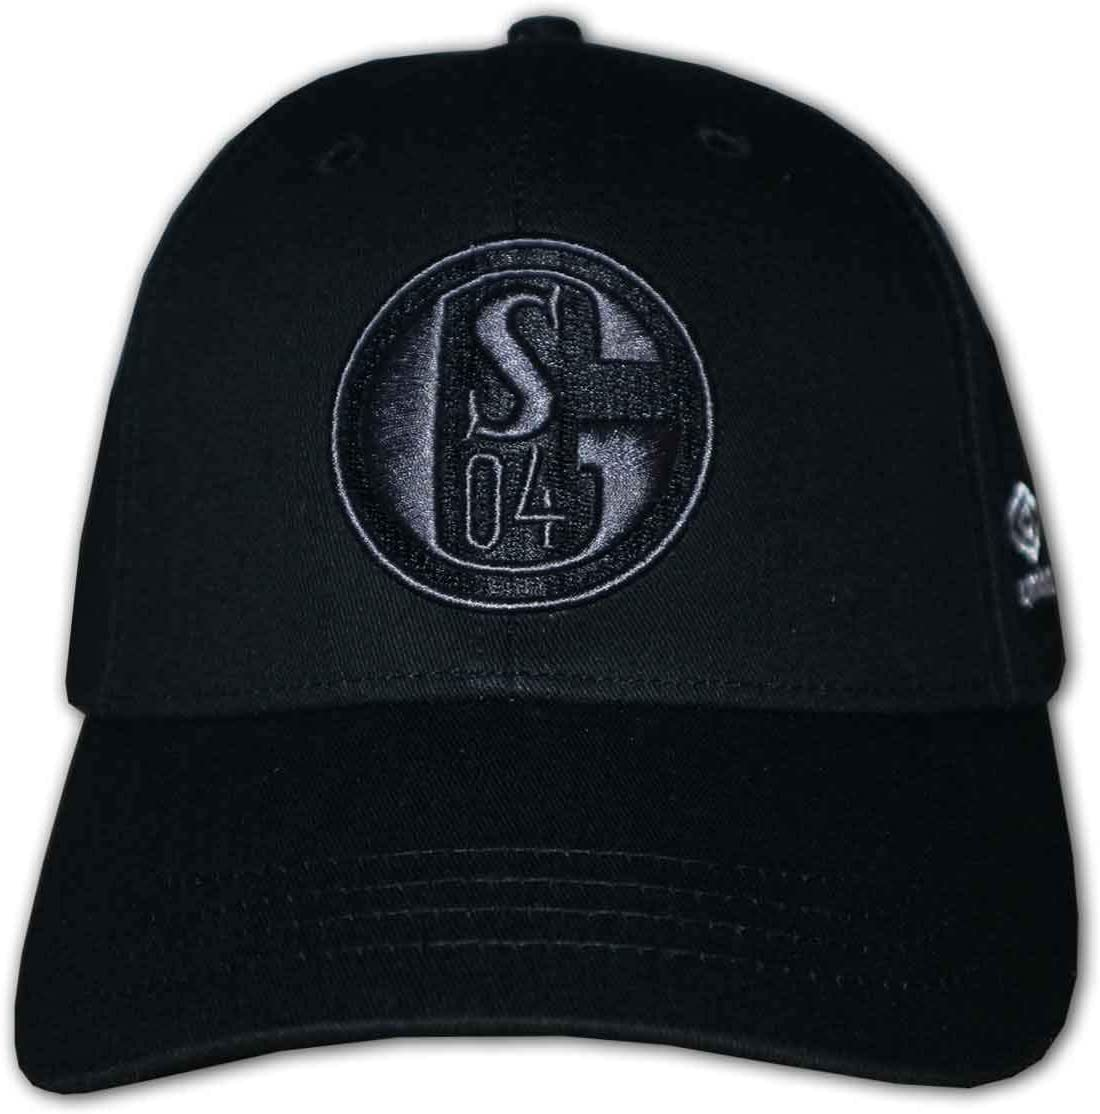 Umbro FC Schalke 04 Black 3D Cap S04 Fan Basecap verstellbar Einheitsgröße